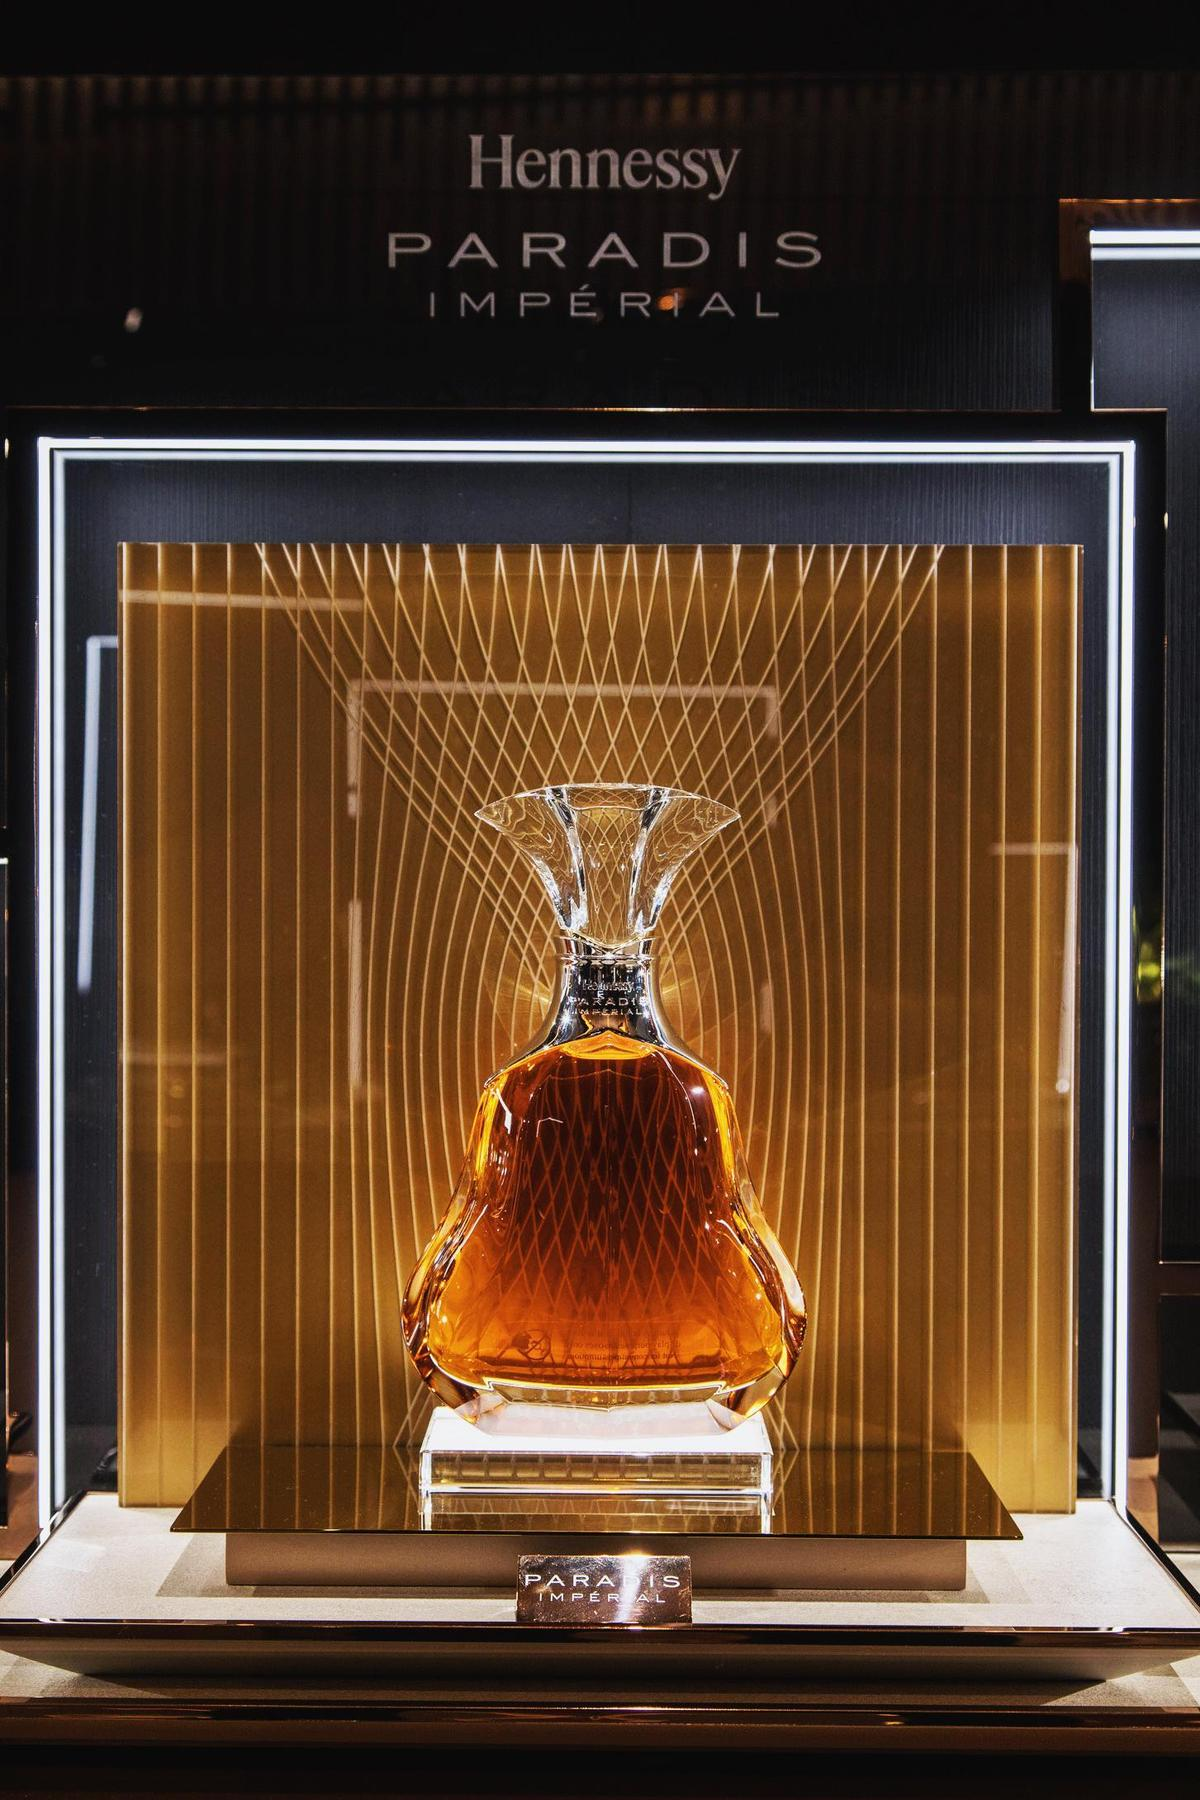 Hennessy Paradis Imperial百樂廷皇禧干邑雖然是老酒,卻不厚重,反而充滿輕盈花香。(軒尼詩提供)